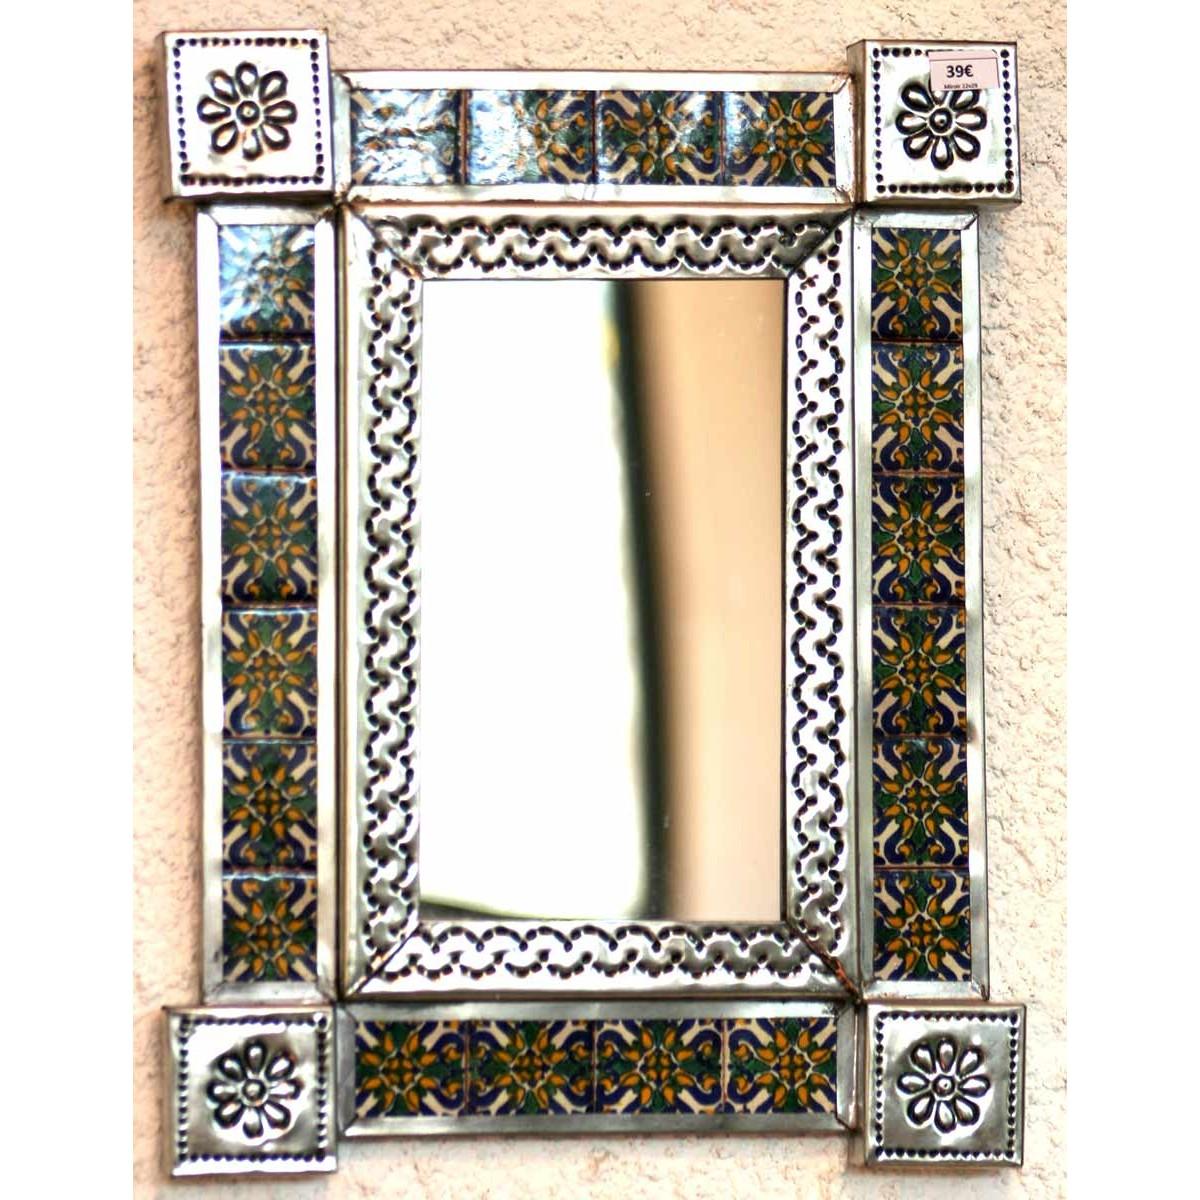 Petit miroir d coration murale miroir mexicain d cor avec azulejos - Miroir decoration murale ...